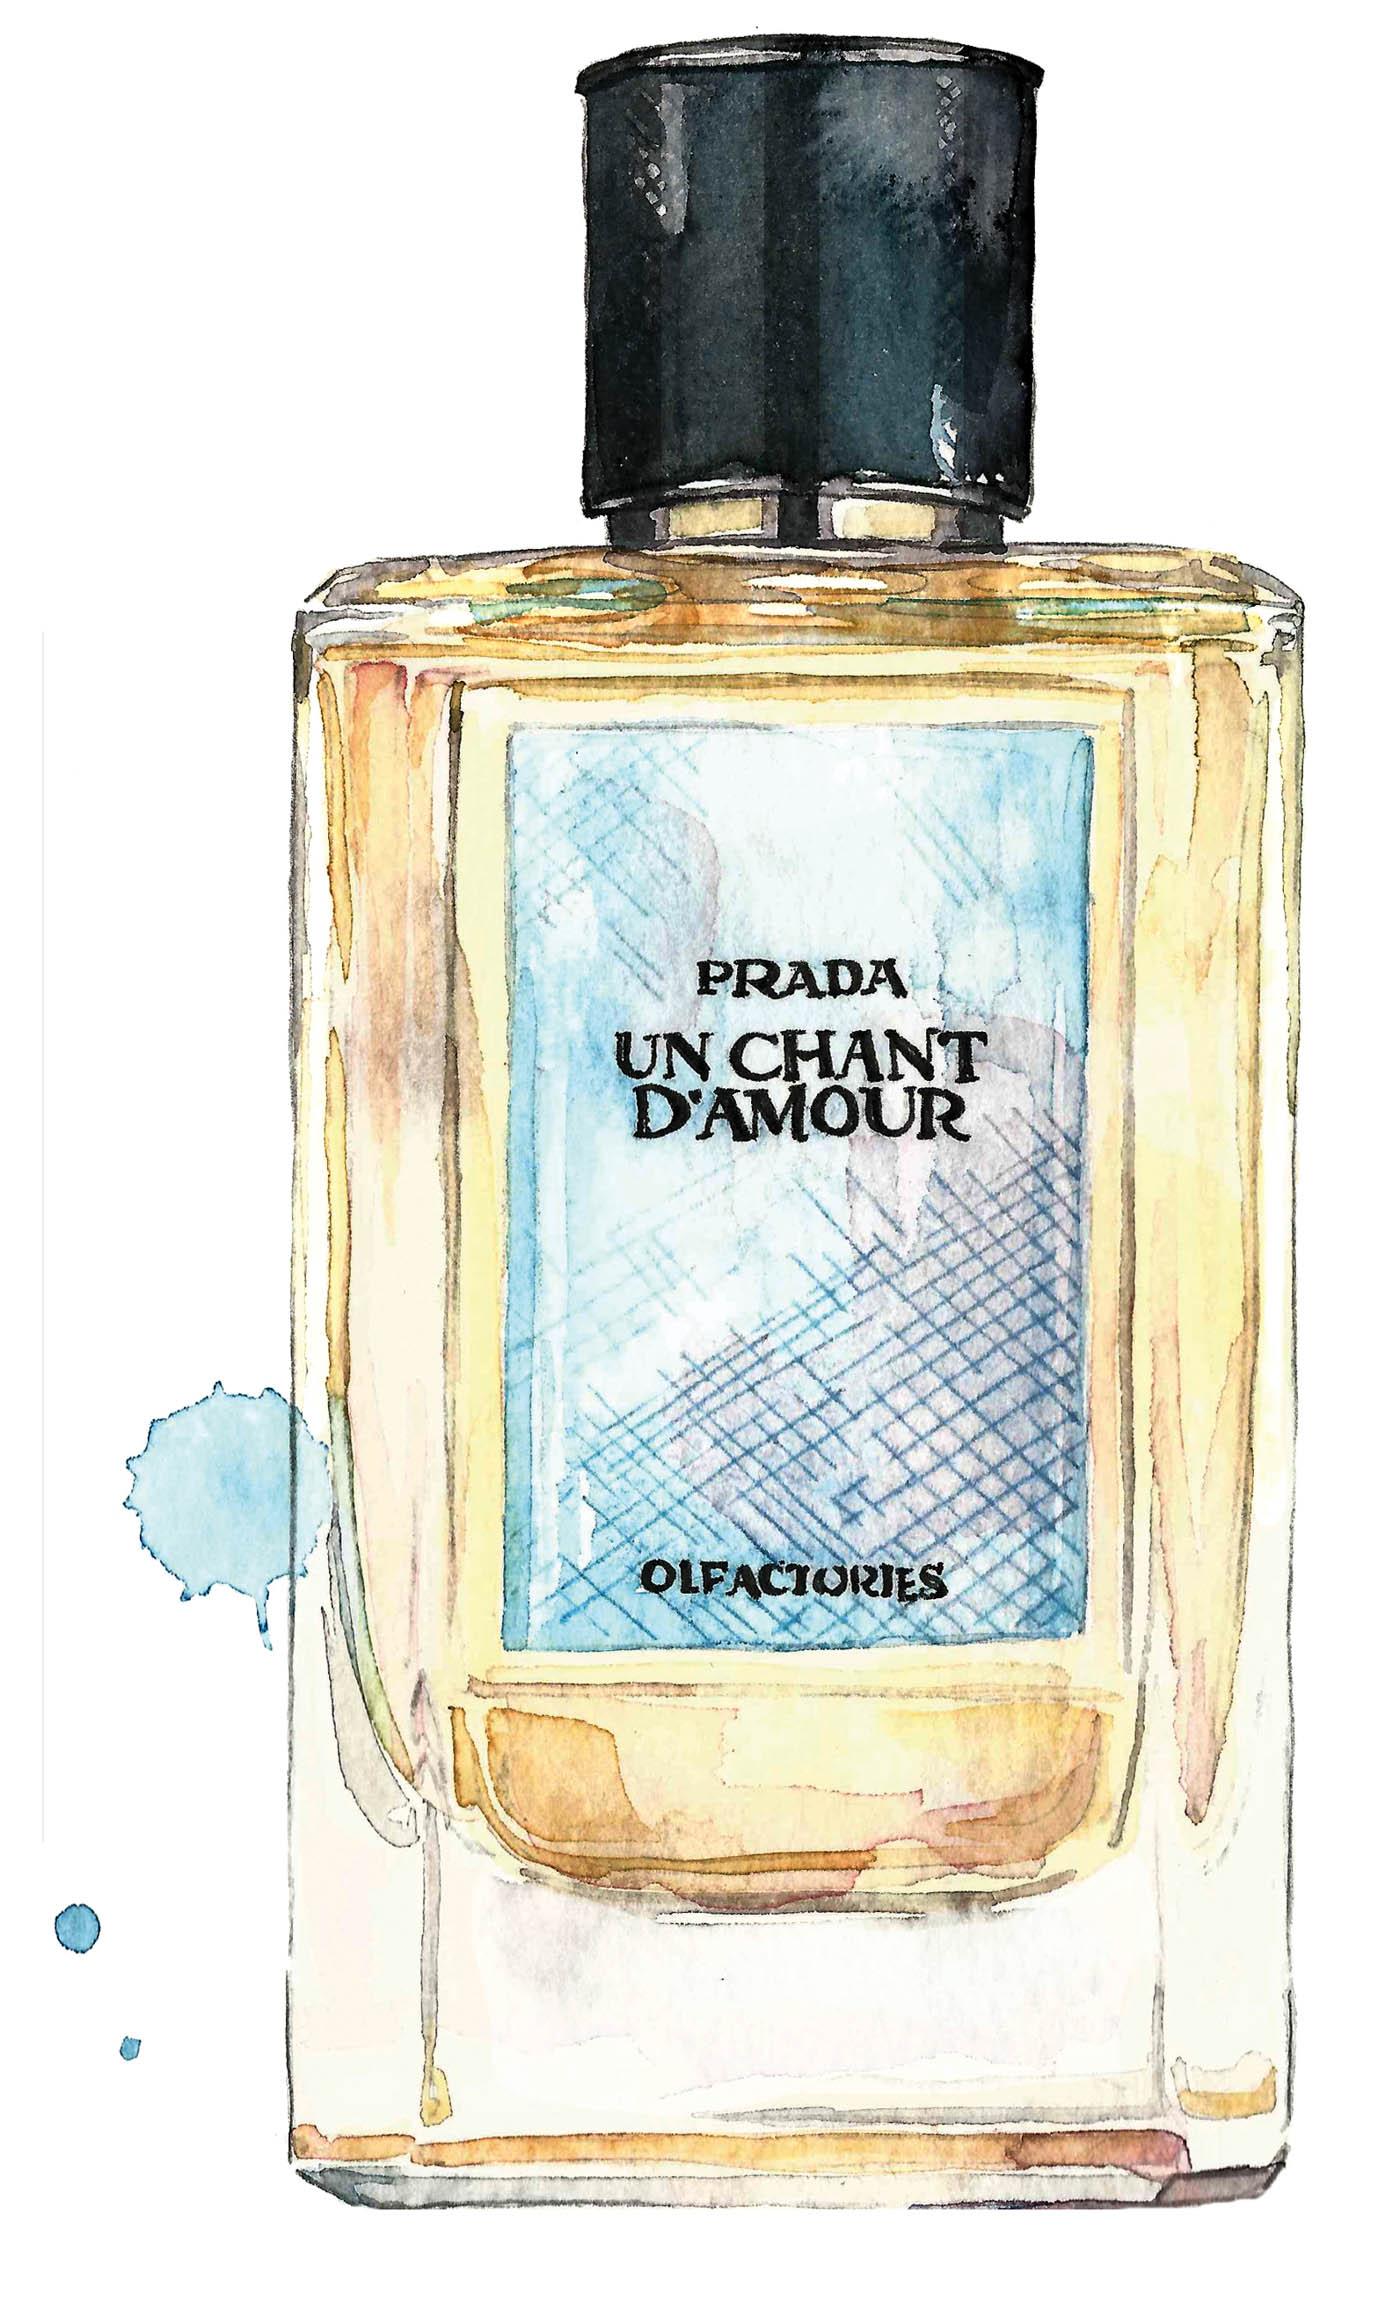 Fragrance Of The Week Prada Olfactories Un Chant Damour